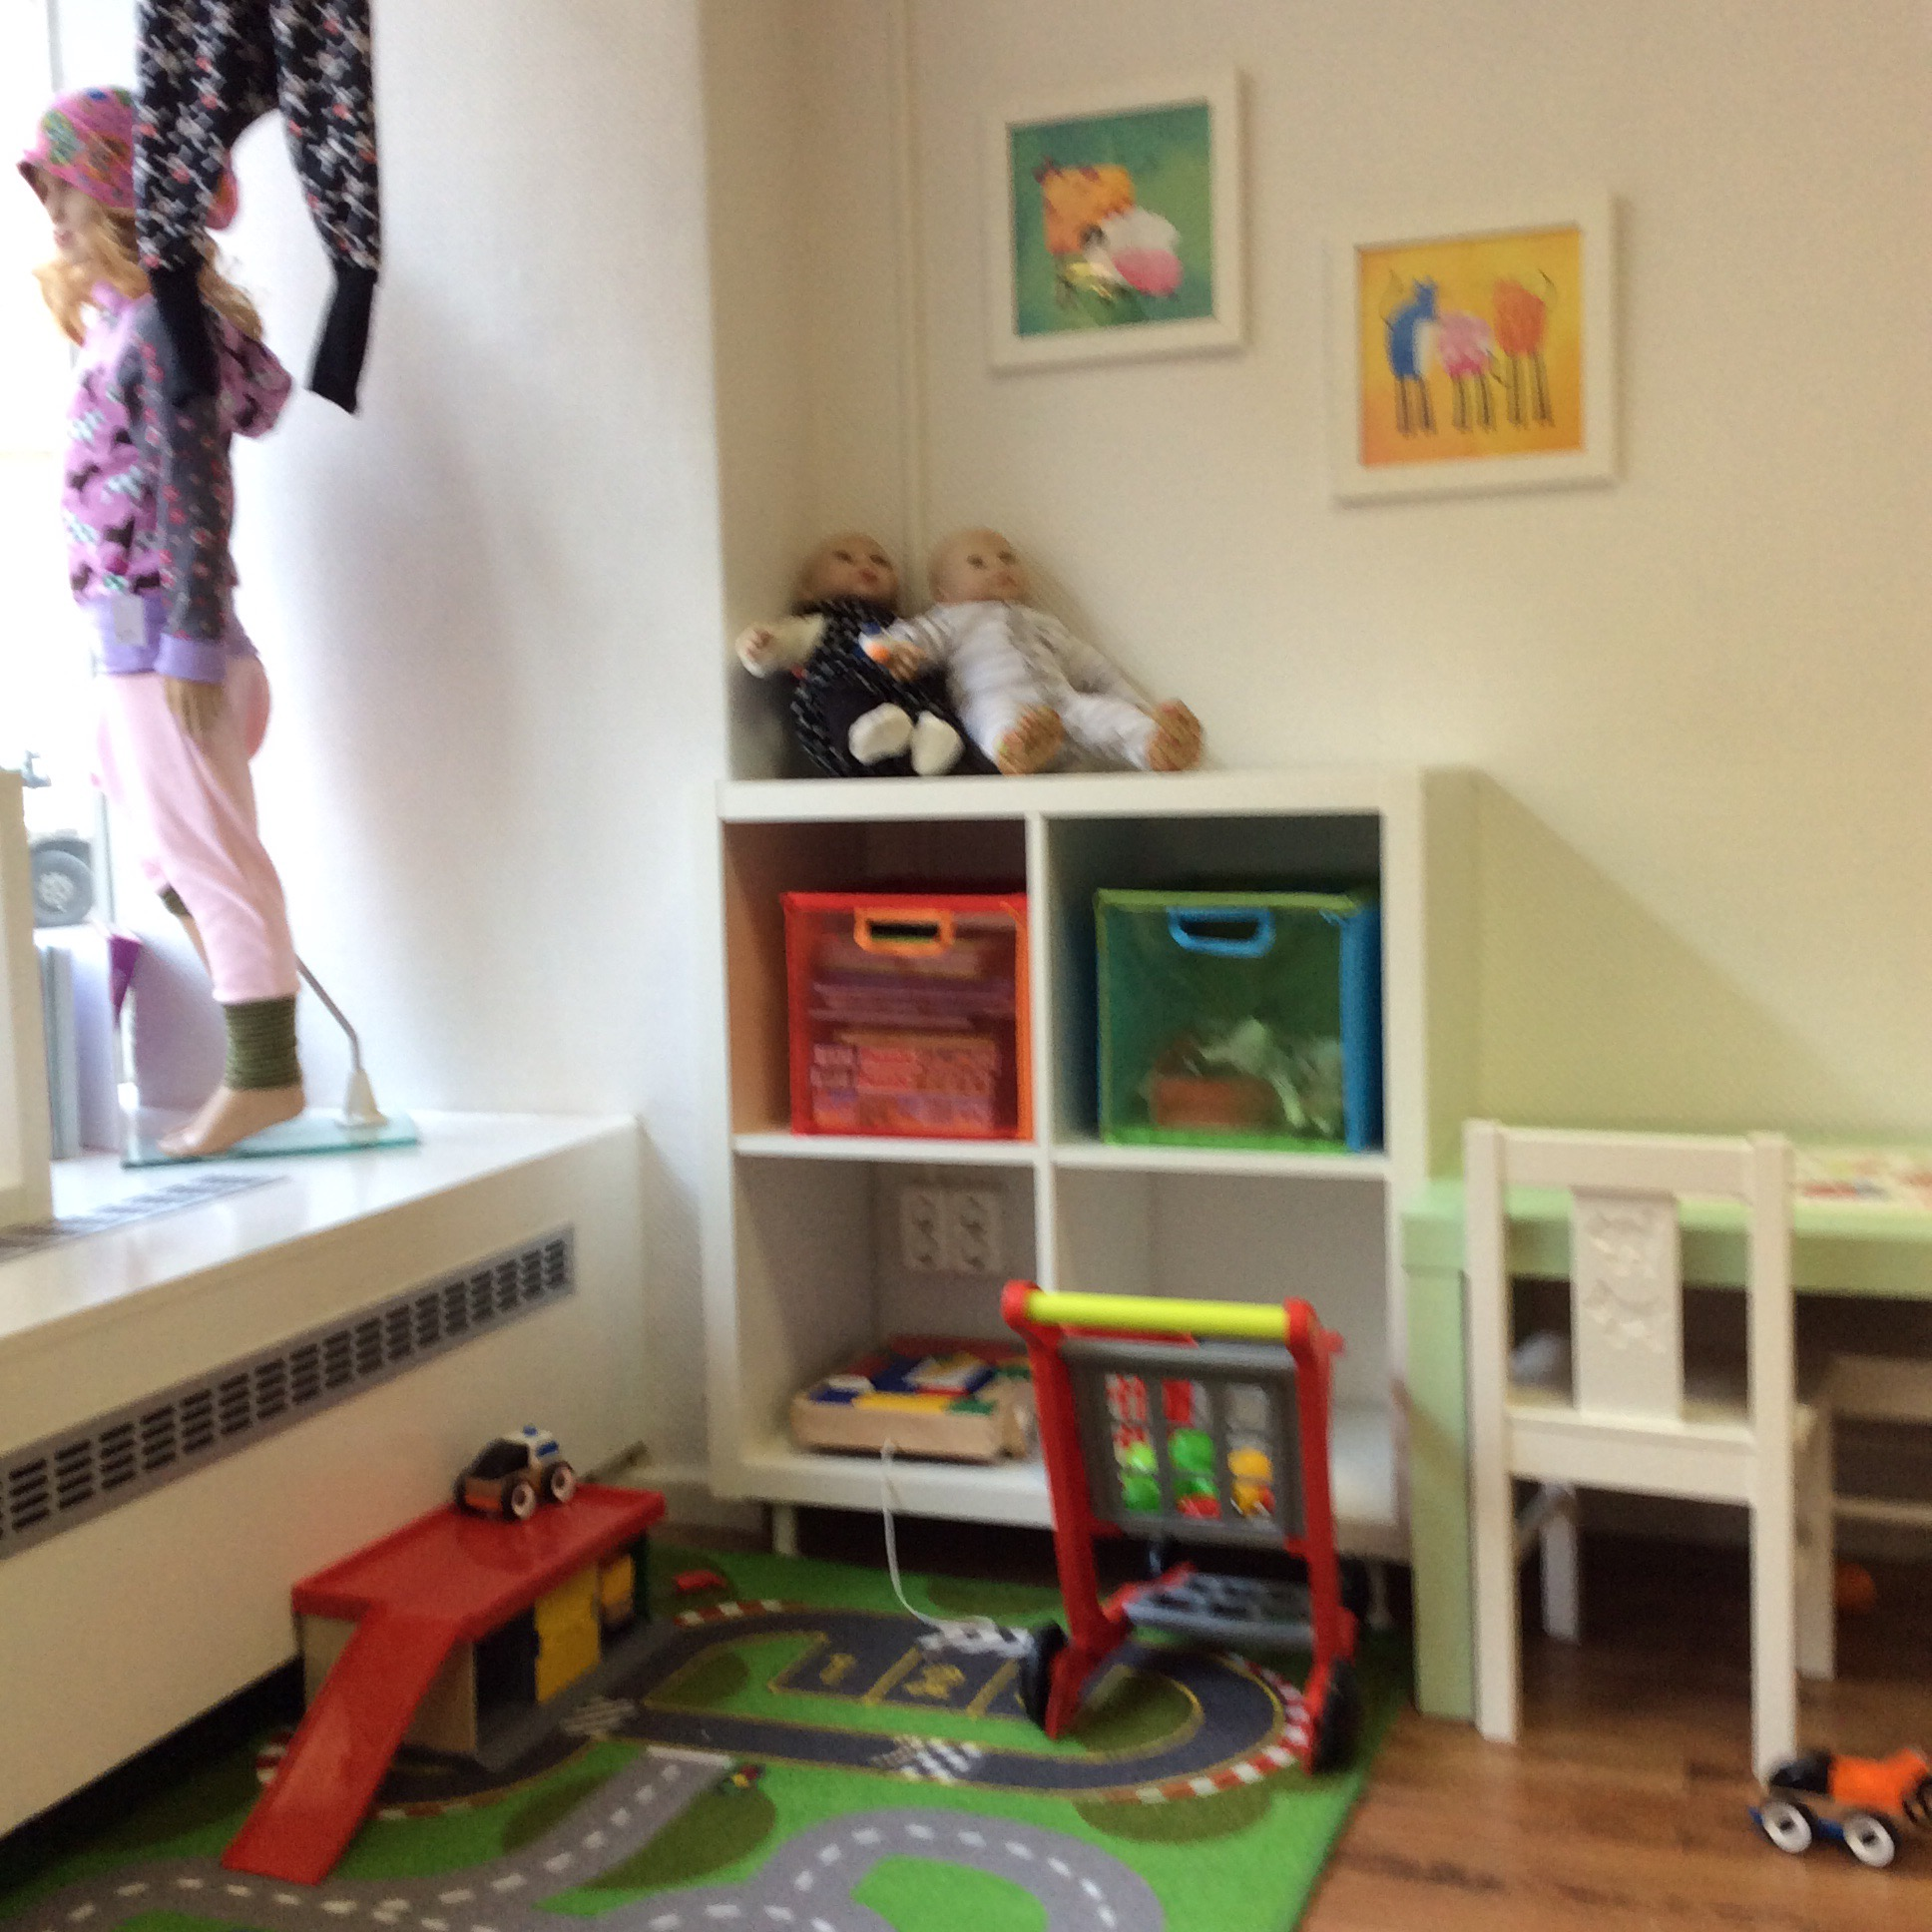 n hkurse in charlottenburg schurrmurr. Black Bedroom Furniture Sets. Home Design Ideas